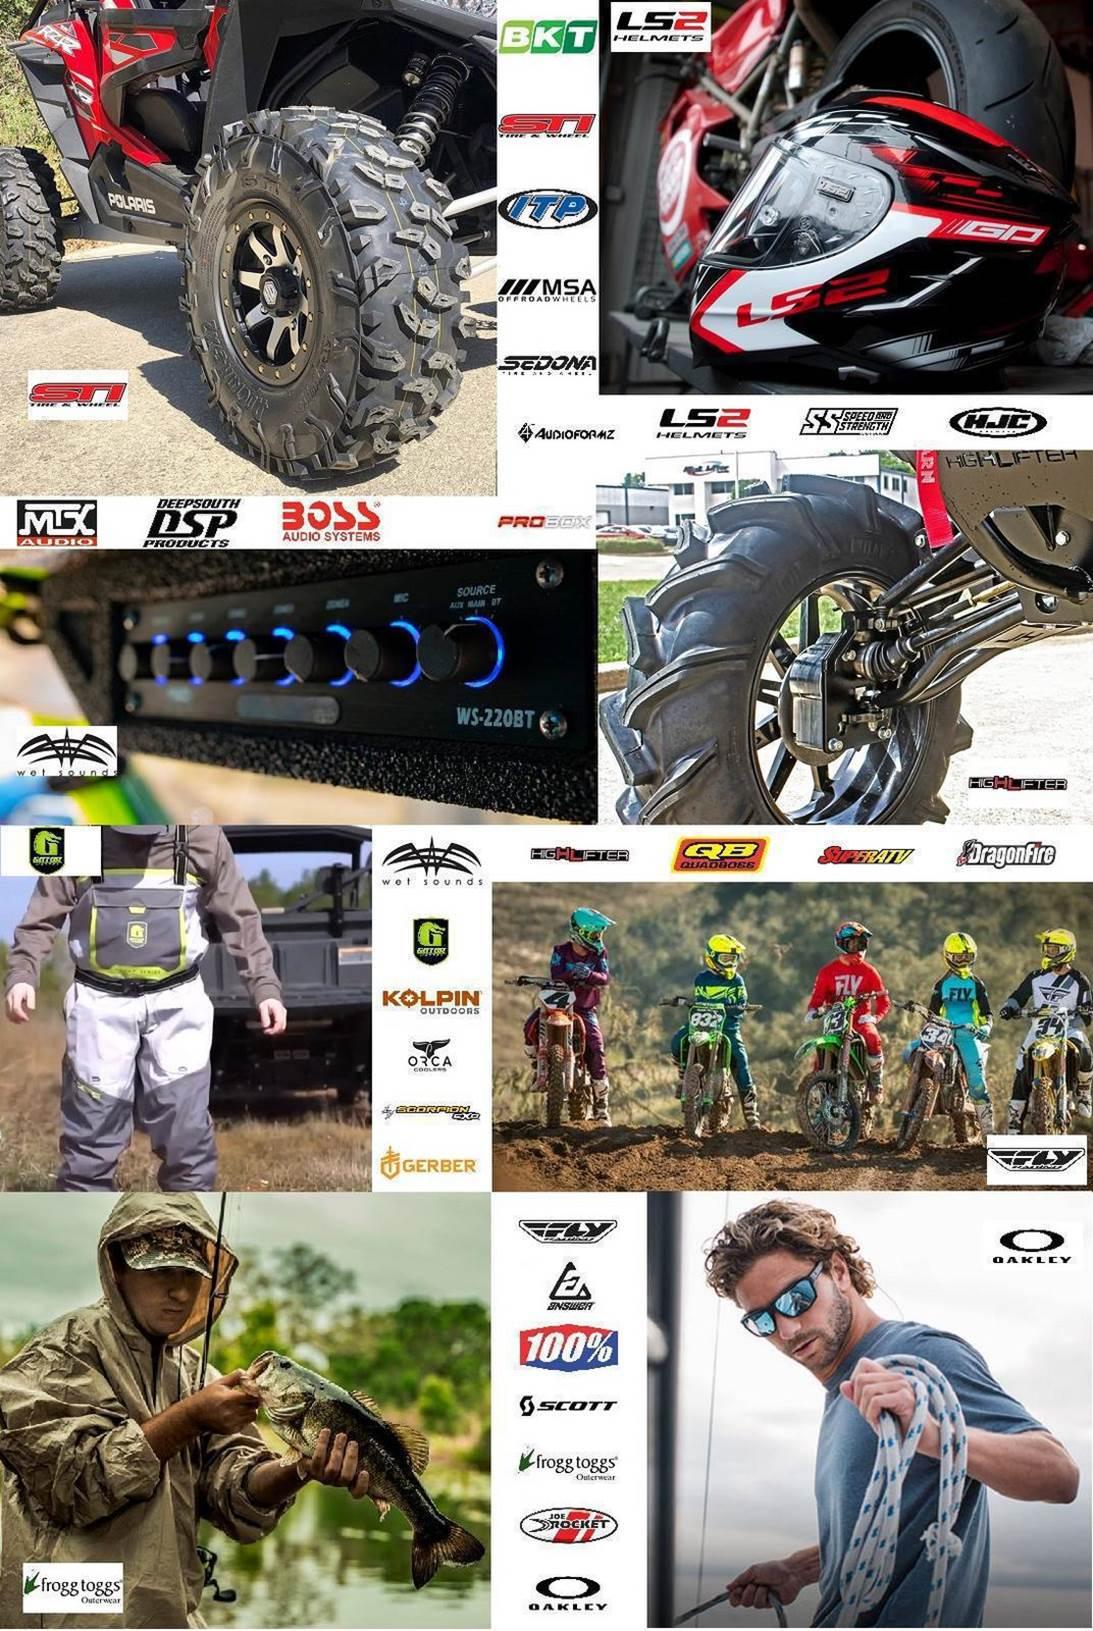 Parts, Accessories, and Apparel Brands Love Motorsports Homosassa